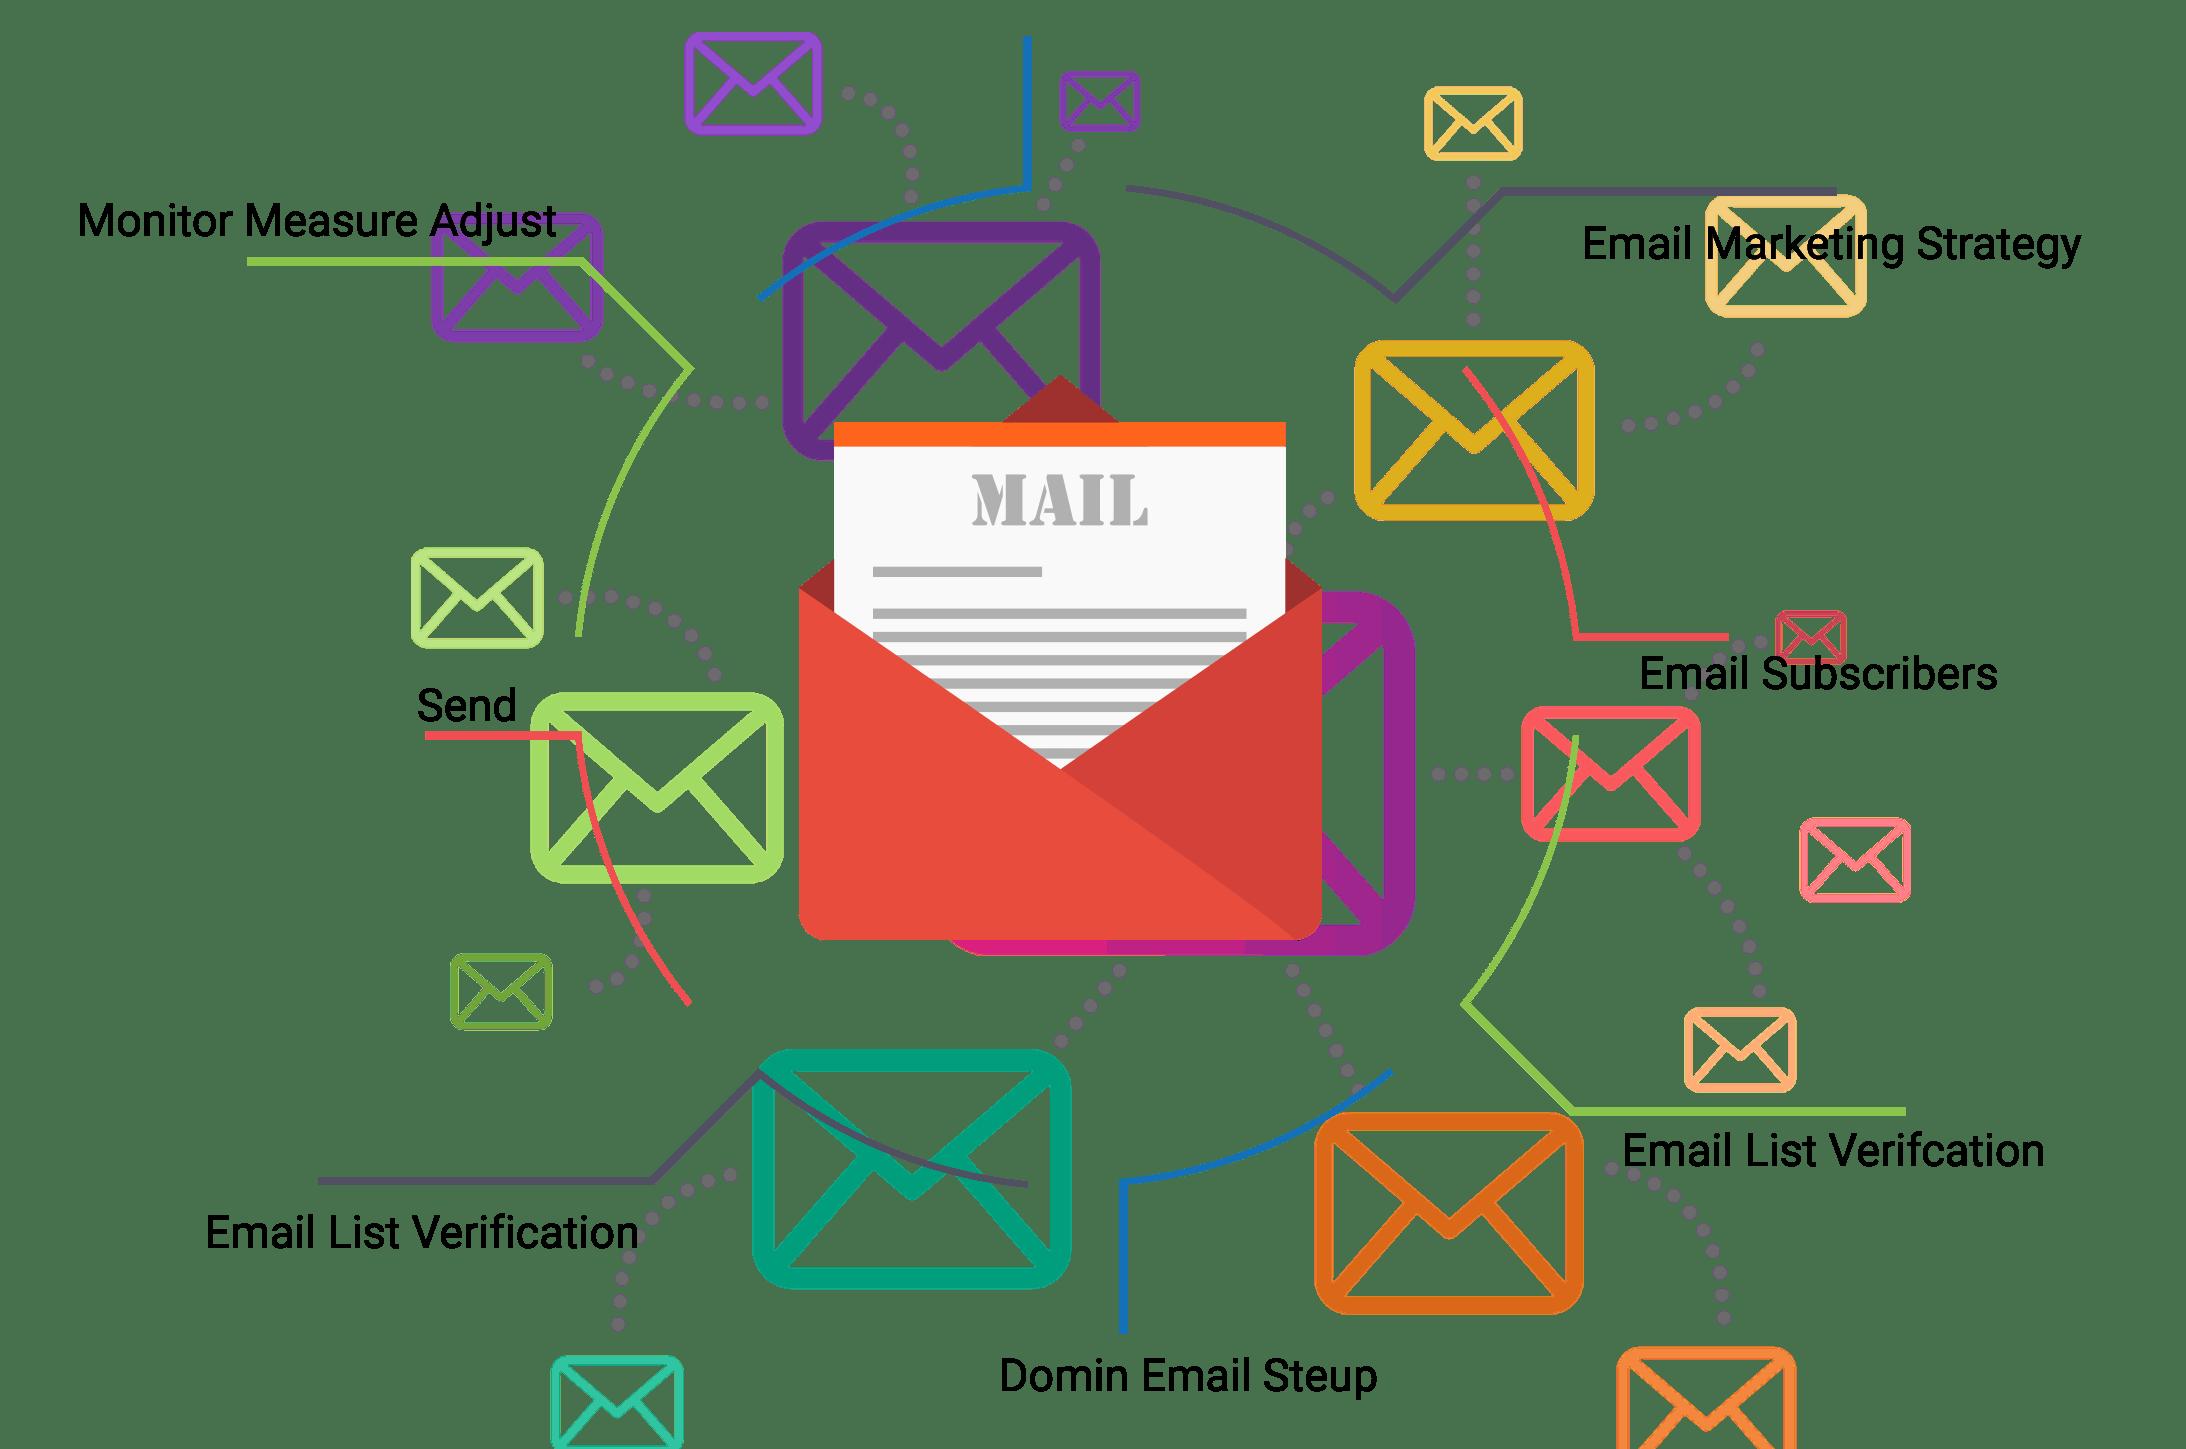 email-marketing-send-bulk-emails-campaign-uae